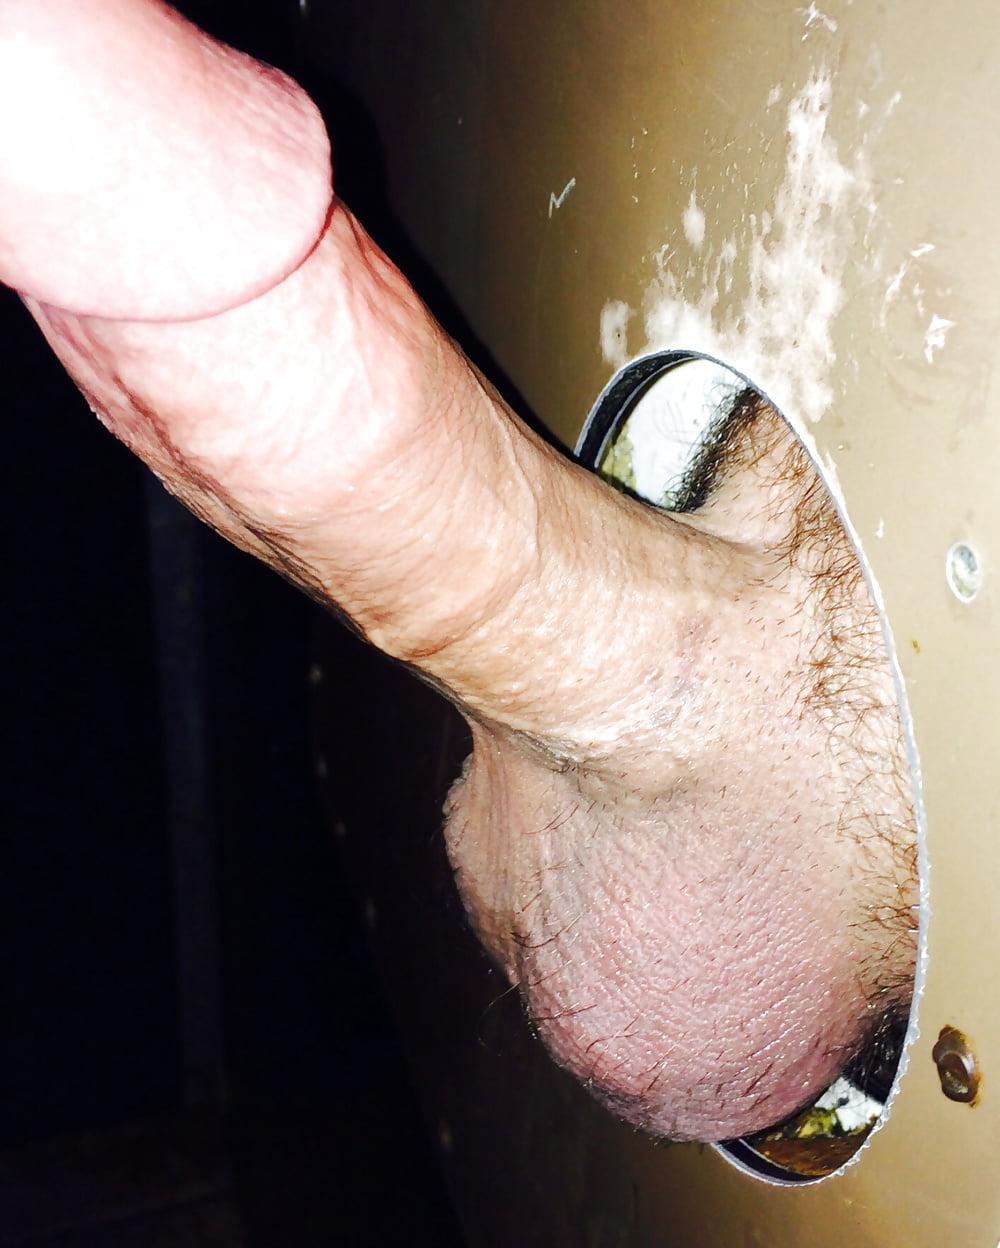 Gay glory hole surprise porn tube